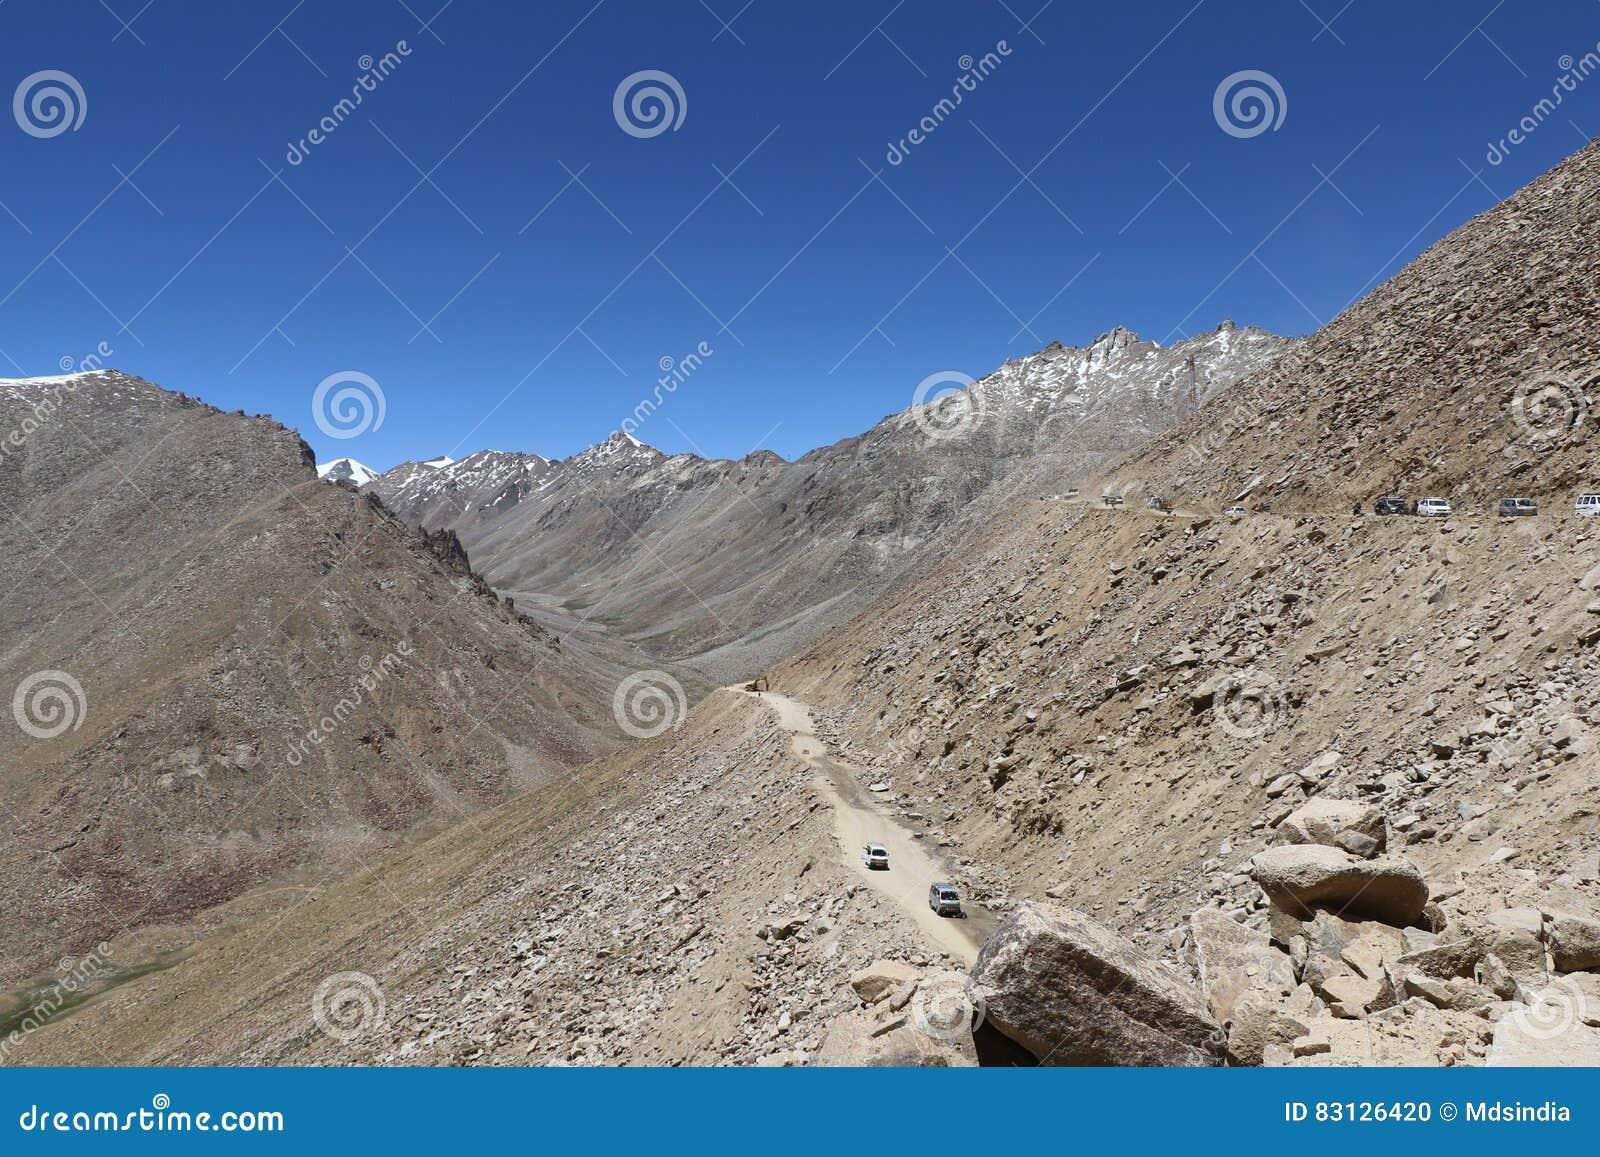 India`s Deadliest, very treacherous and adventurous roads roads